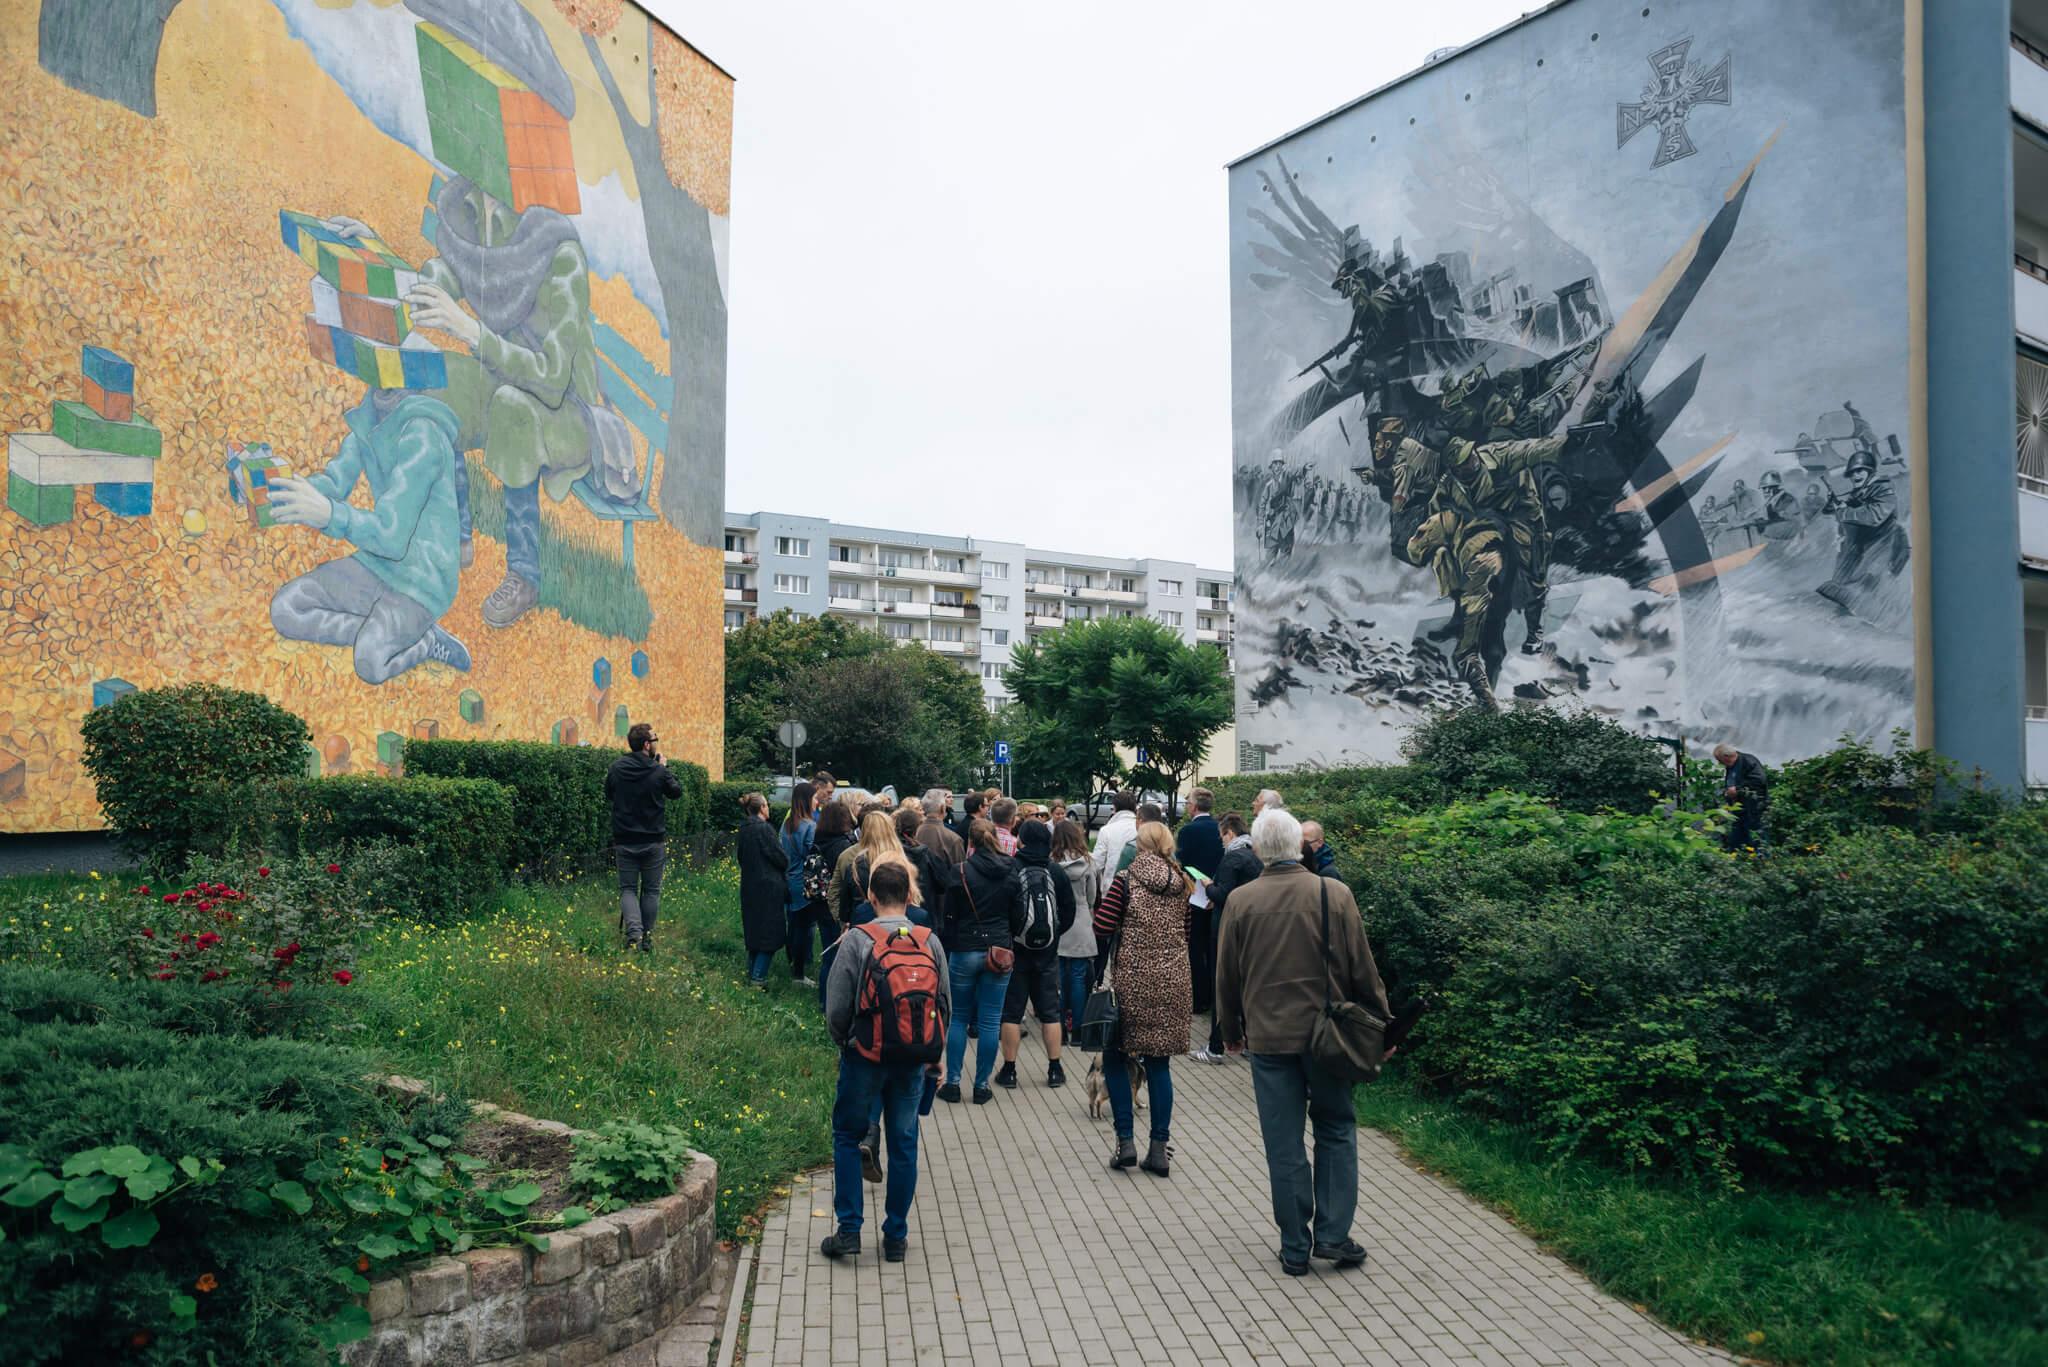 Zaspa Murals fot. Bartosz Banska 7 - Zaspa Murals